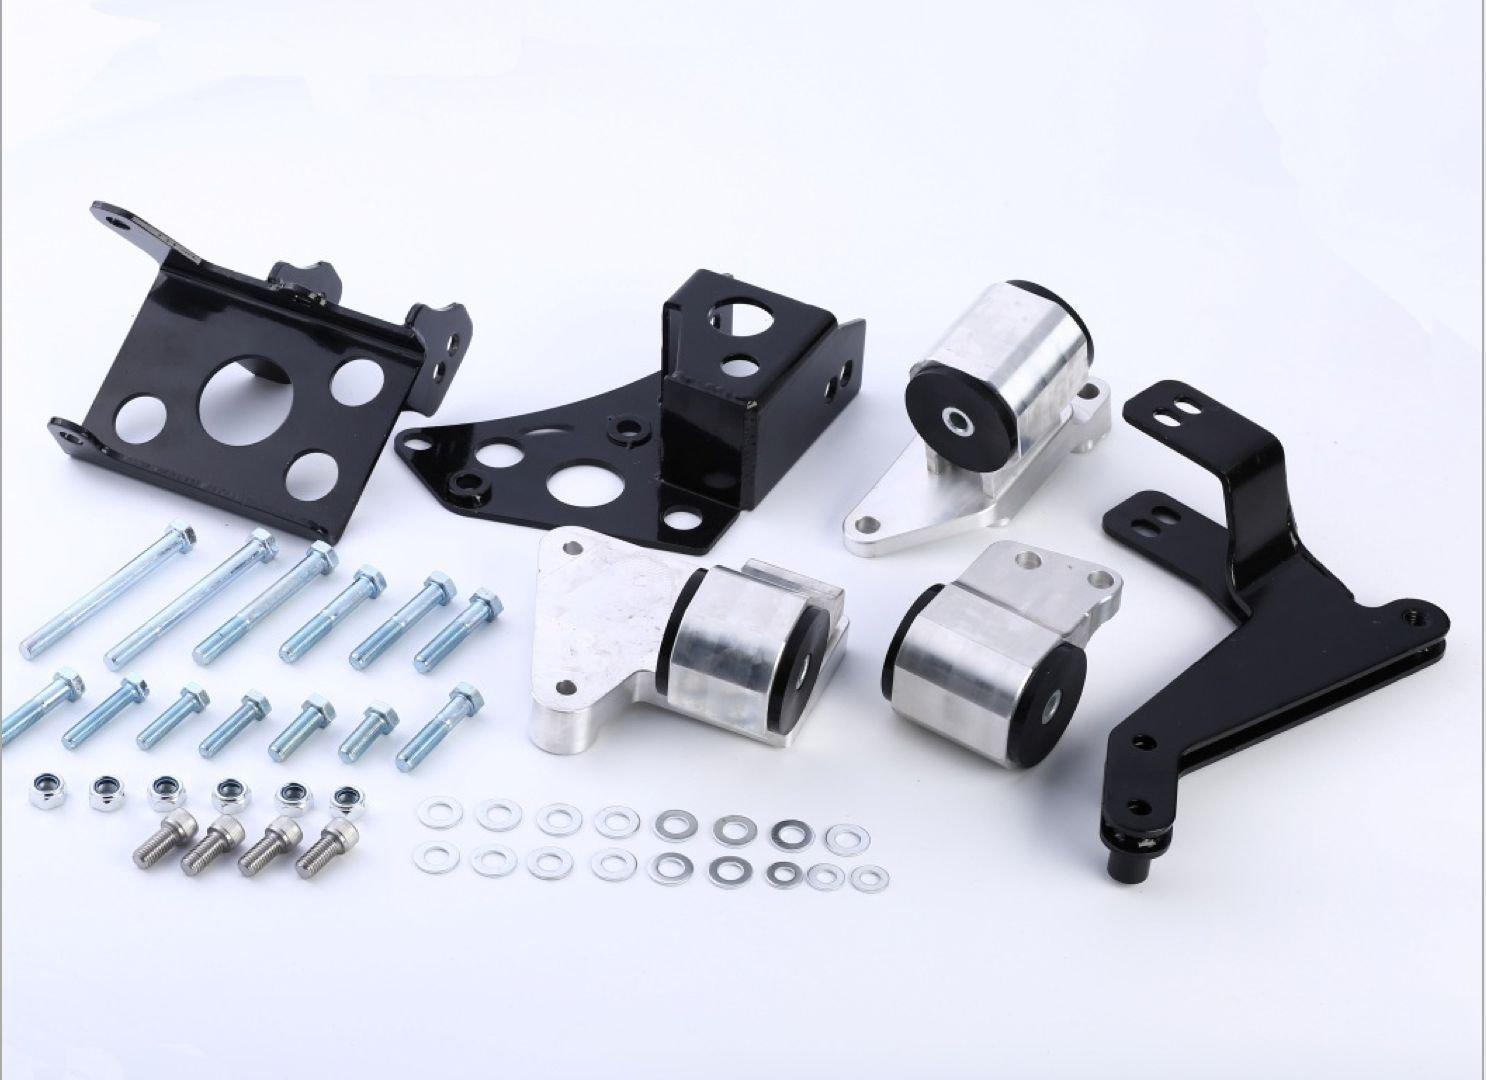 K SERIES SWAP BILLET ALUMINUM ENGINE MOTOR MOUNT KIT 96 - 00 HONDA CIVIC EK K20